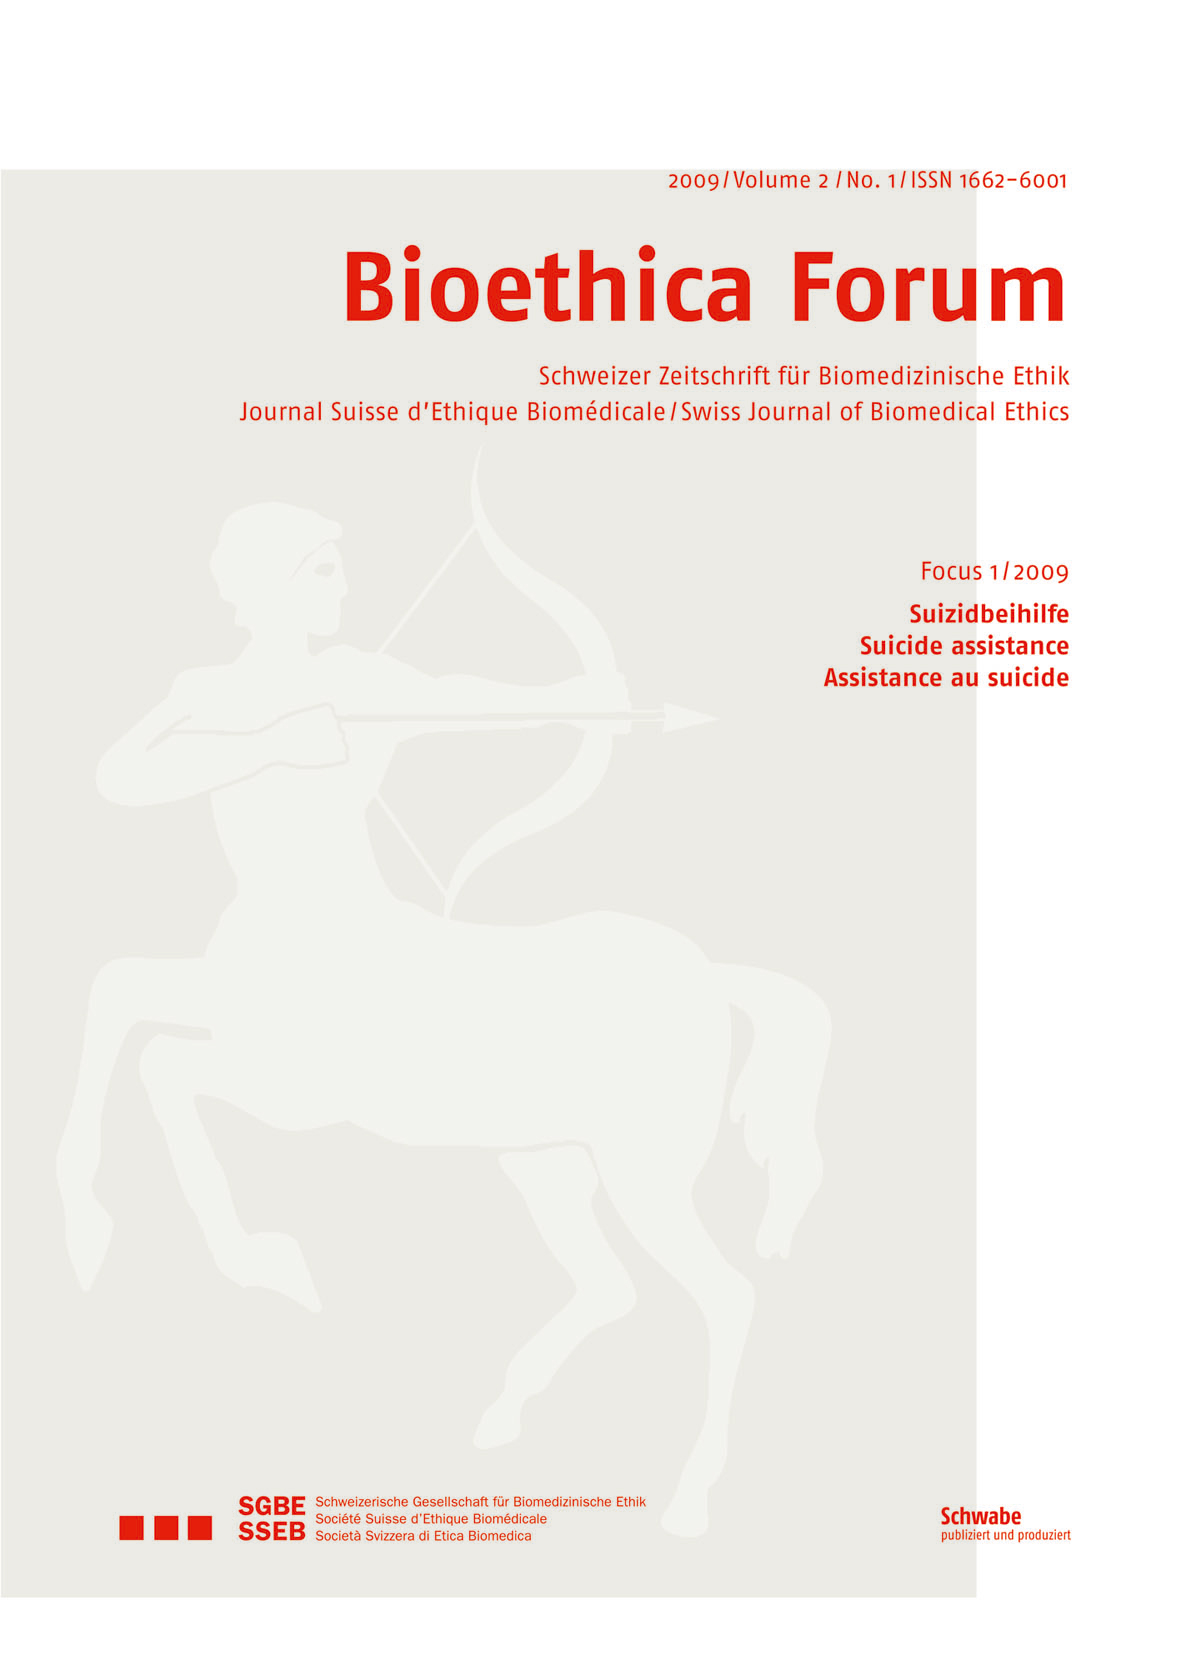 Bioethica Forum